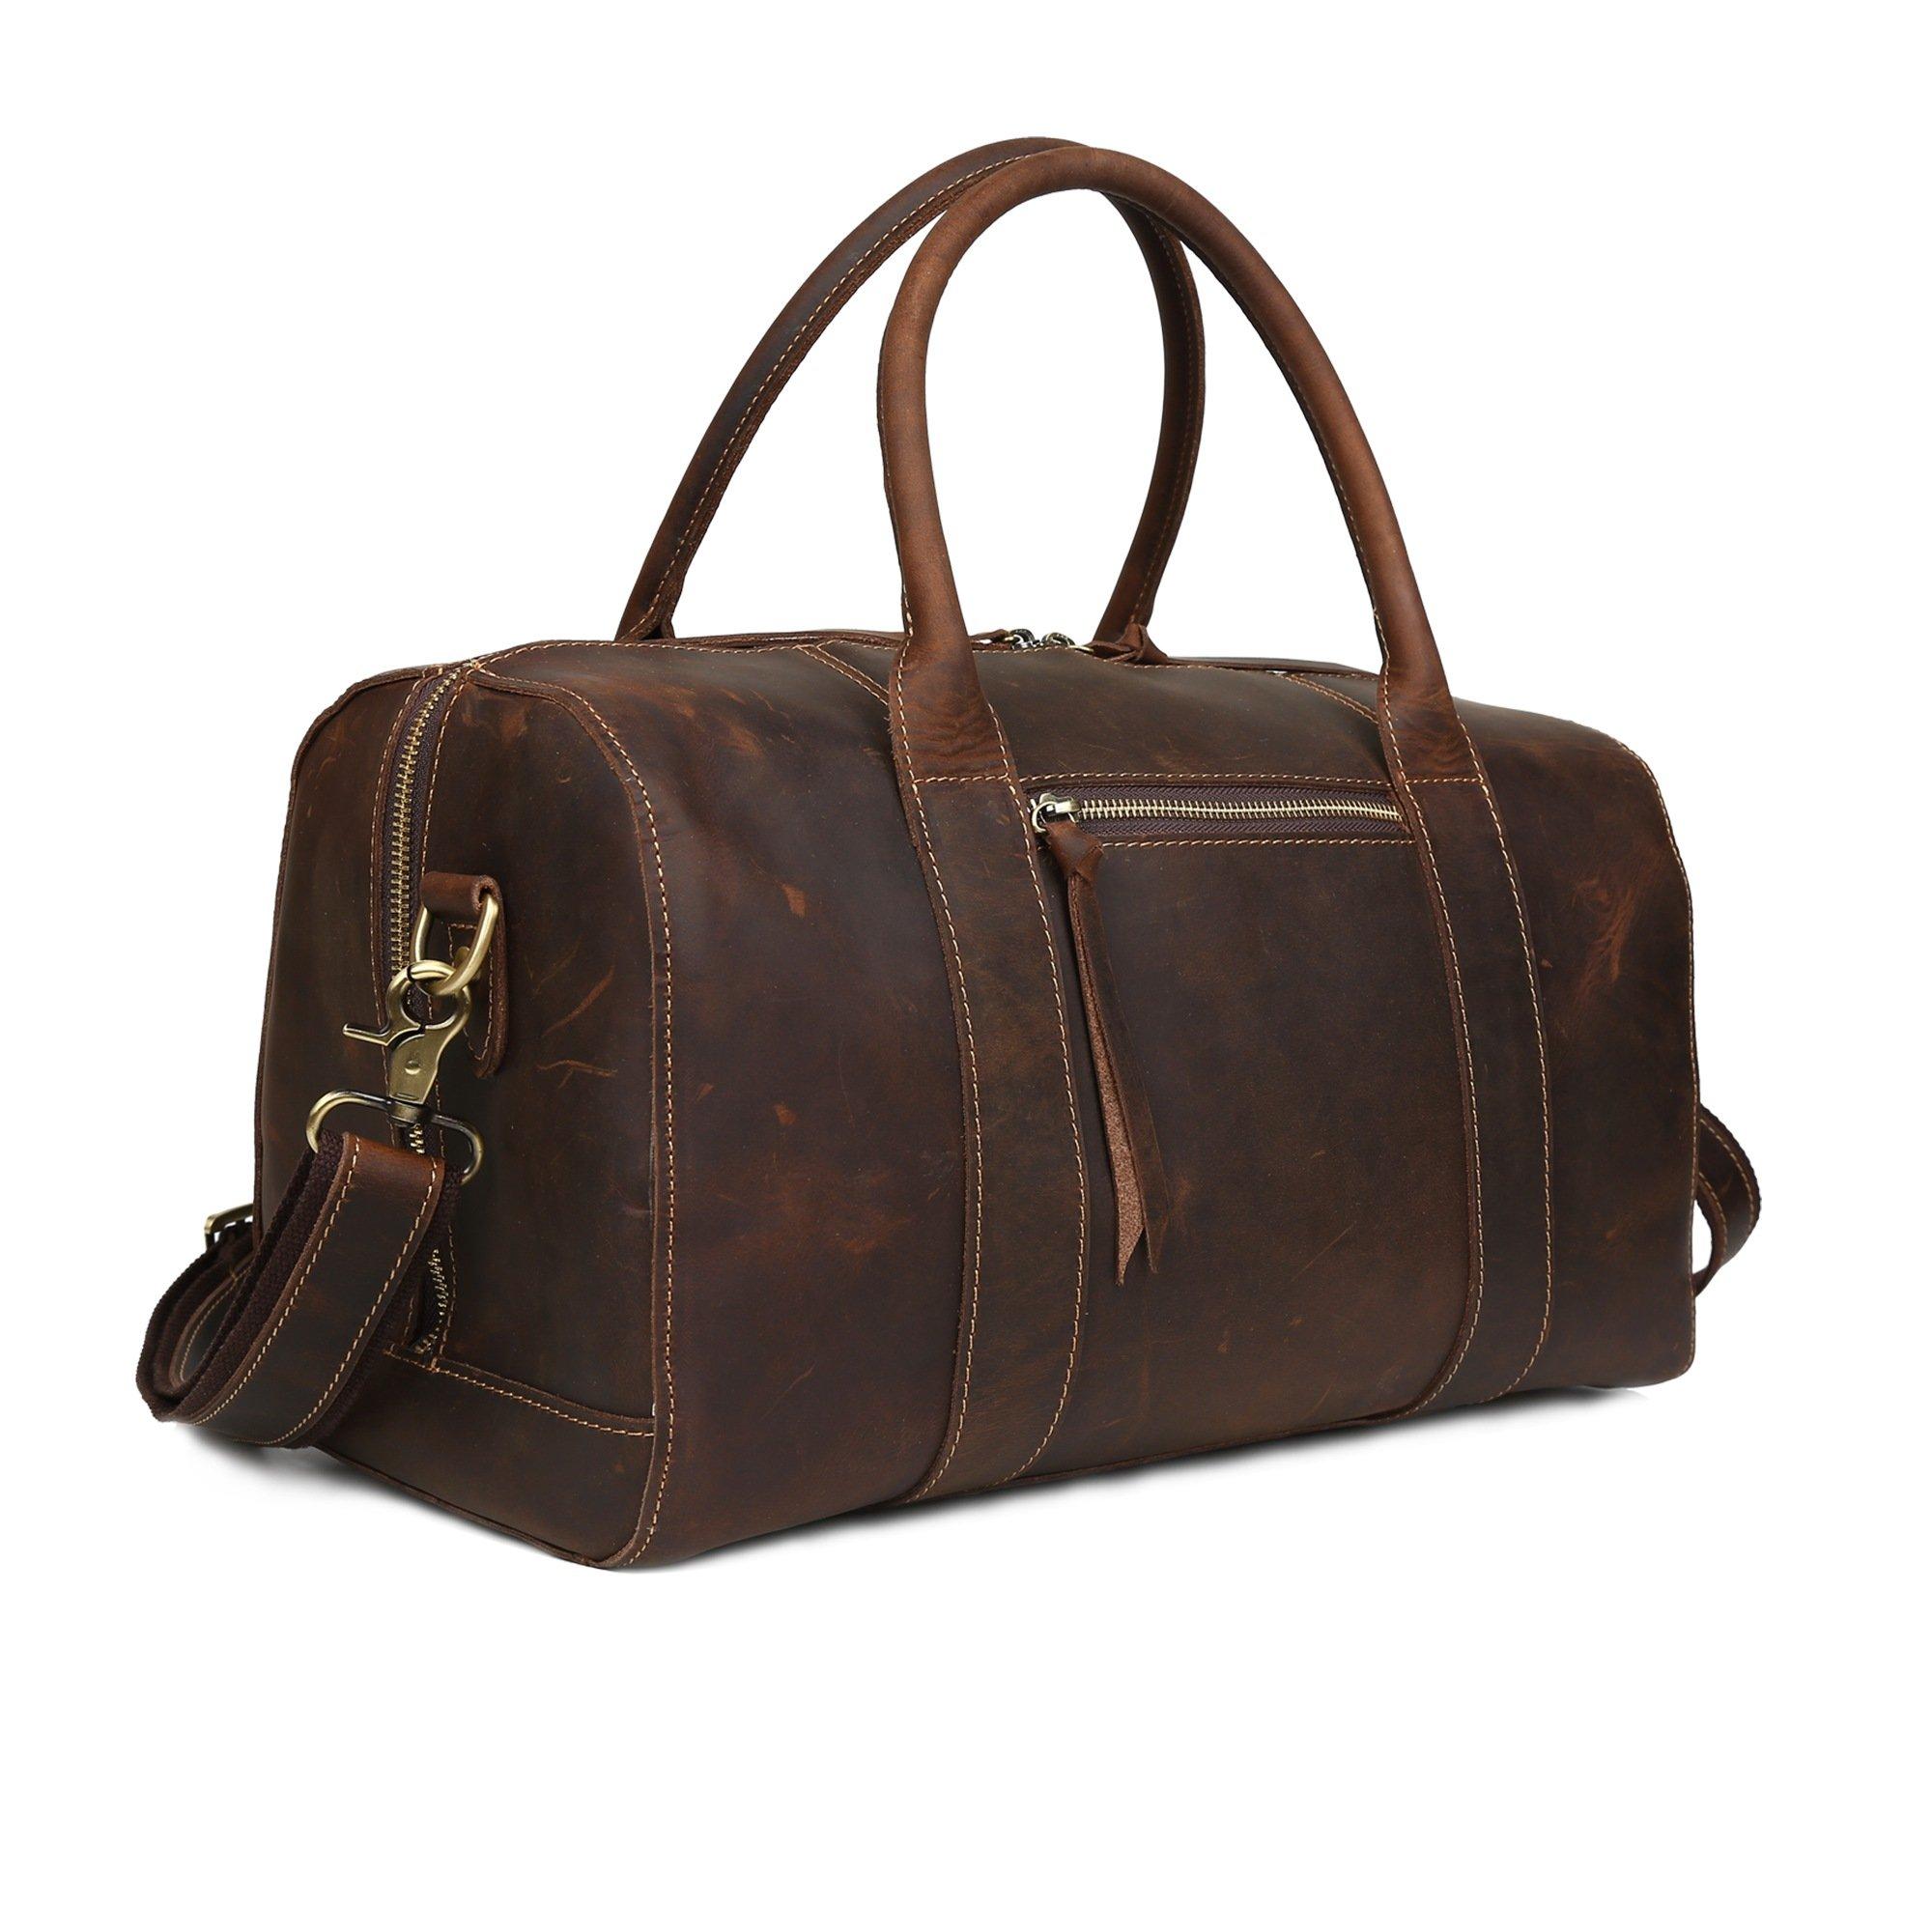 Huntvp Mens Leather Travel Duffle Bags Crazy Horse Vintage Luggage Shoulder Handbags